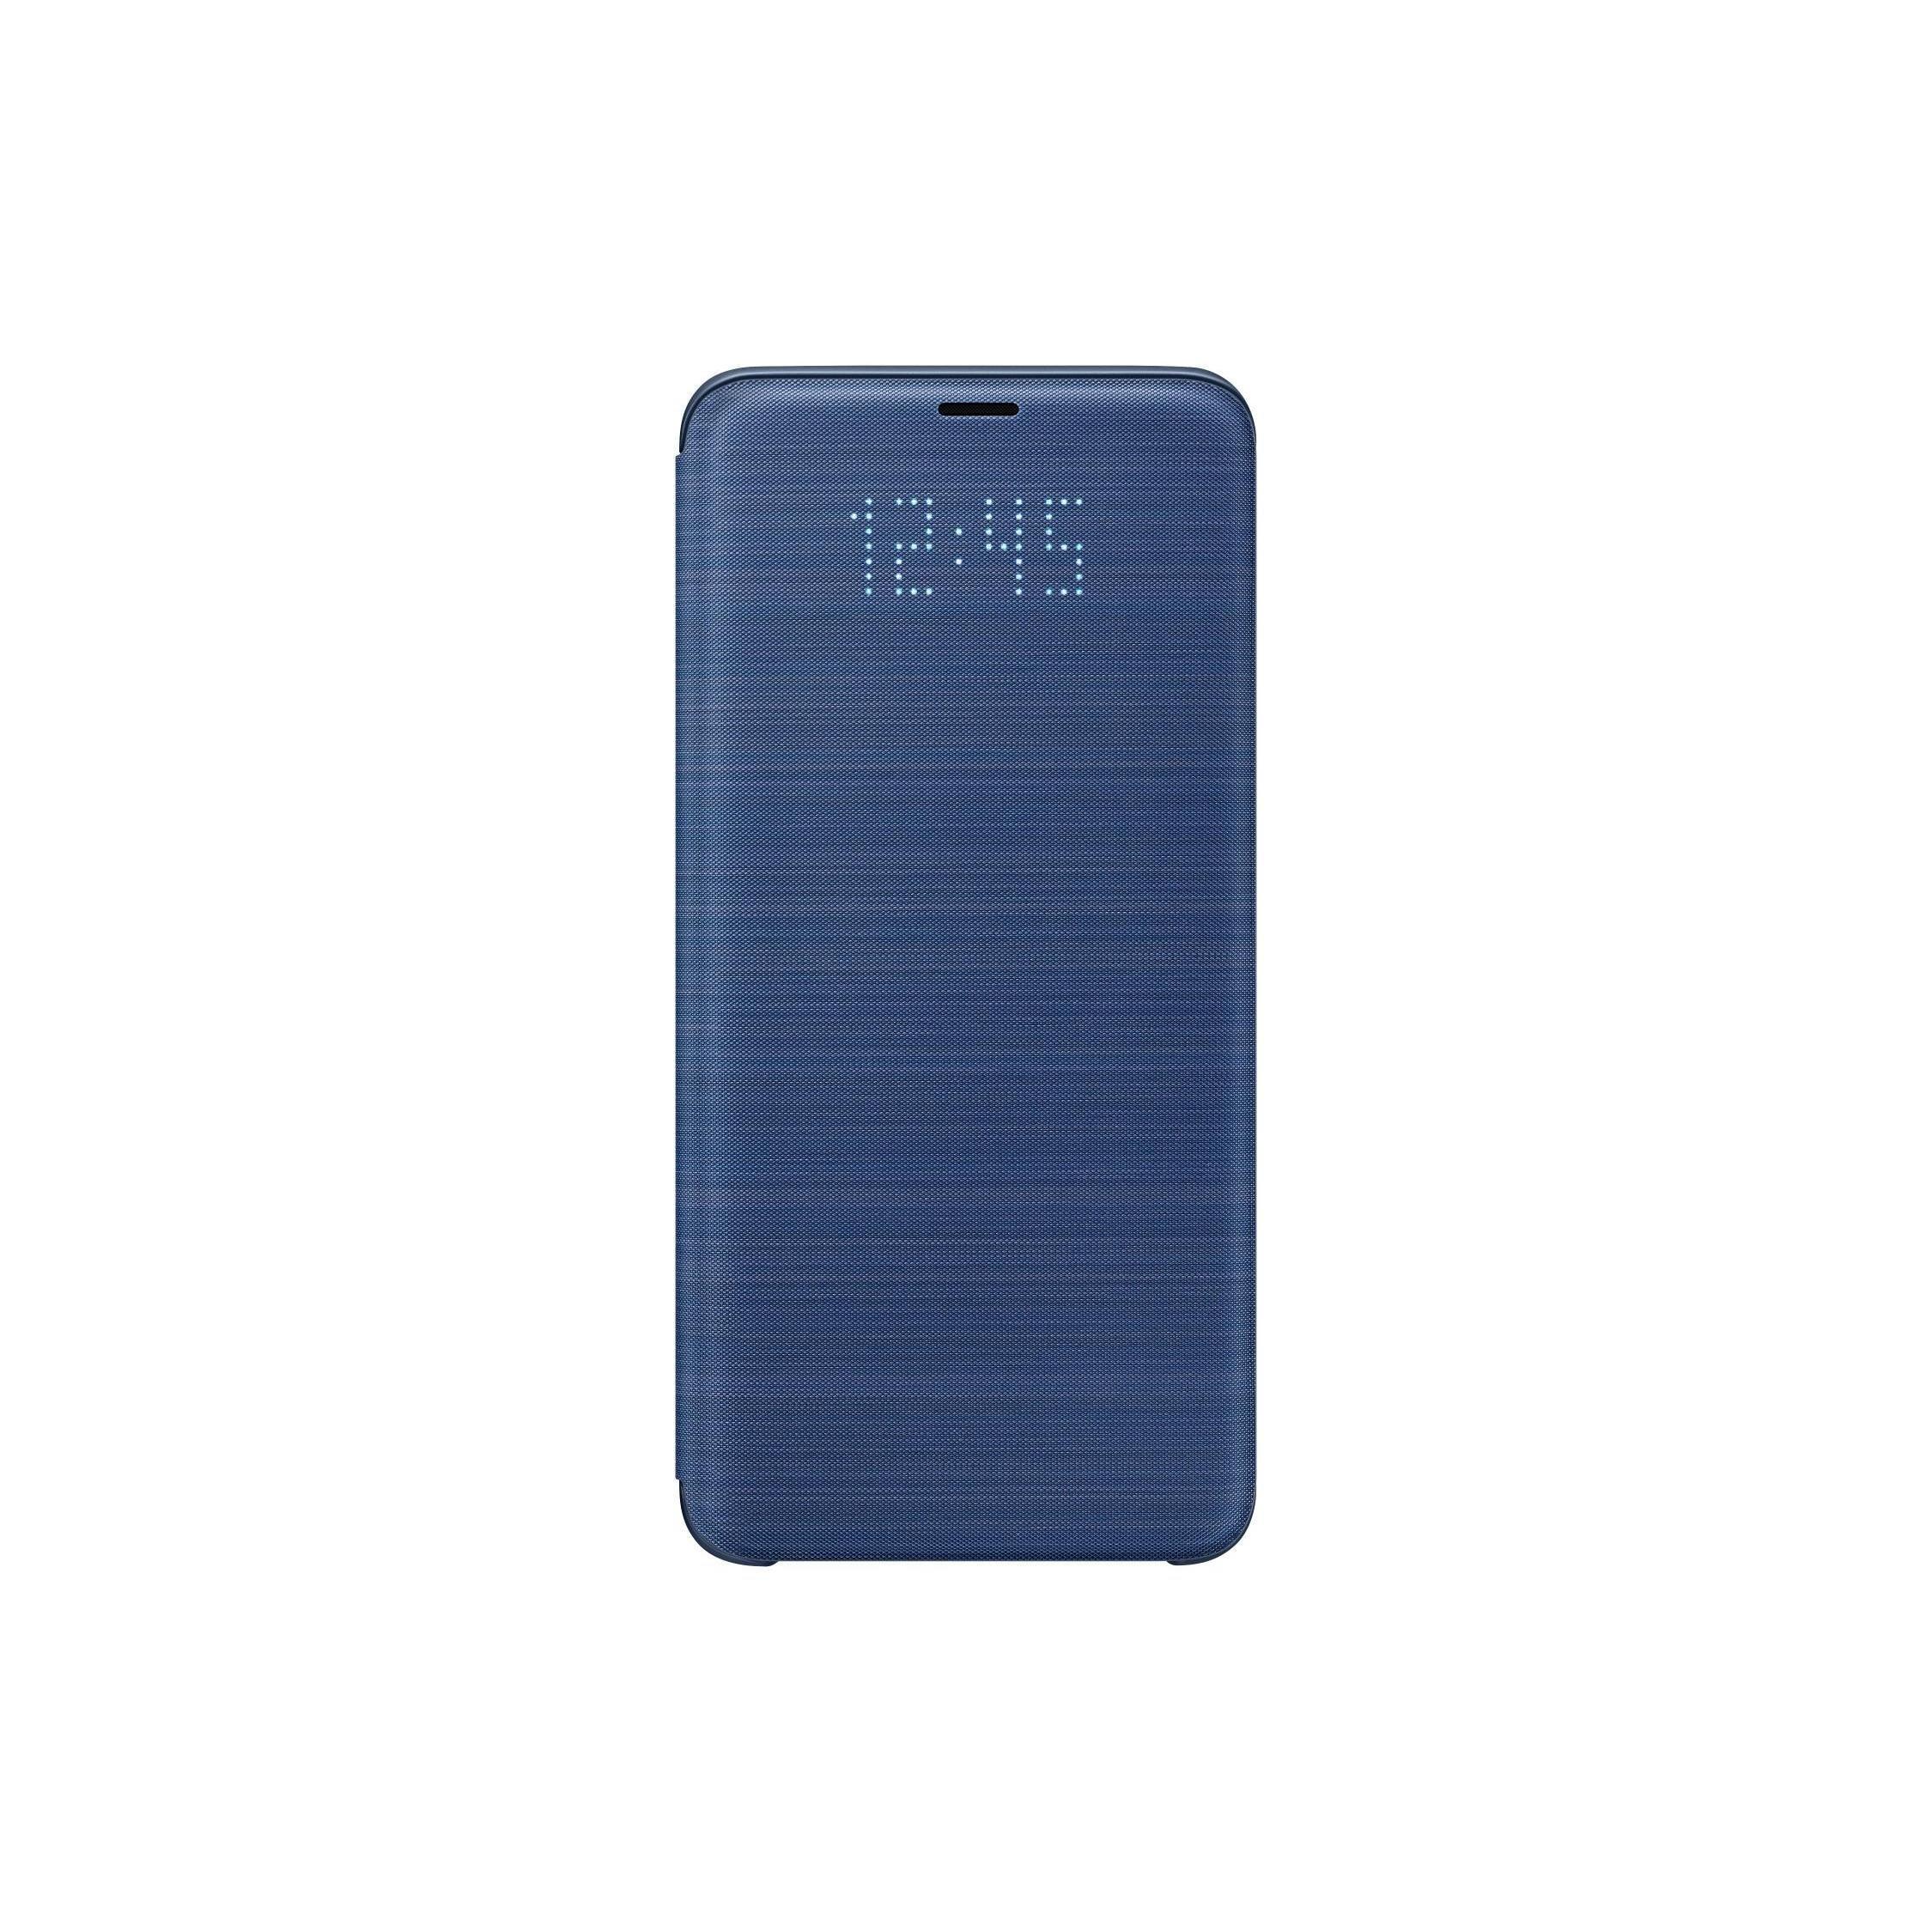 b1b665f8063 oferta en Samsung LED View Cover - Funda para Samsung Galaxy S9+ ...